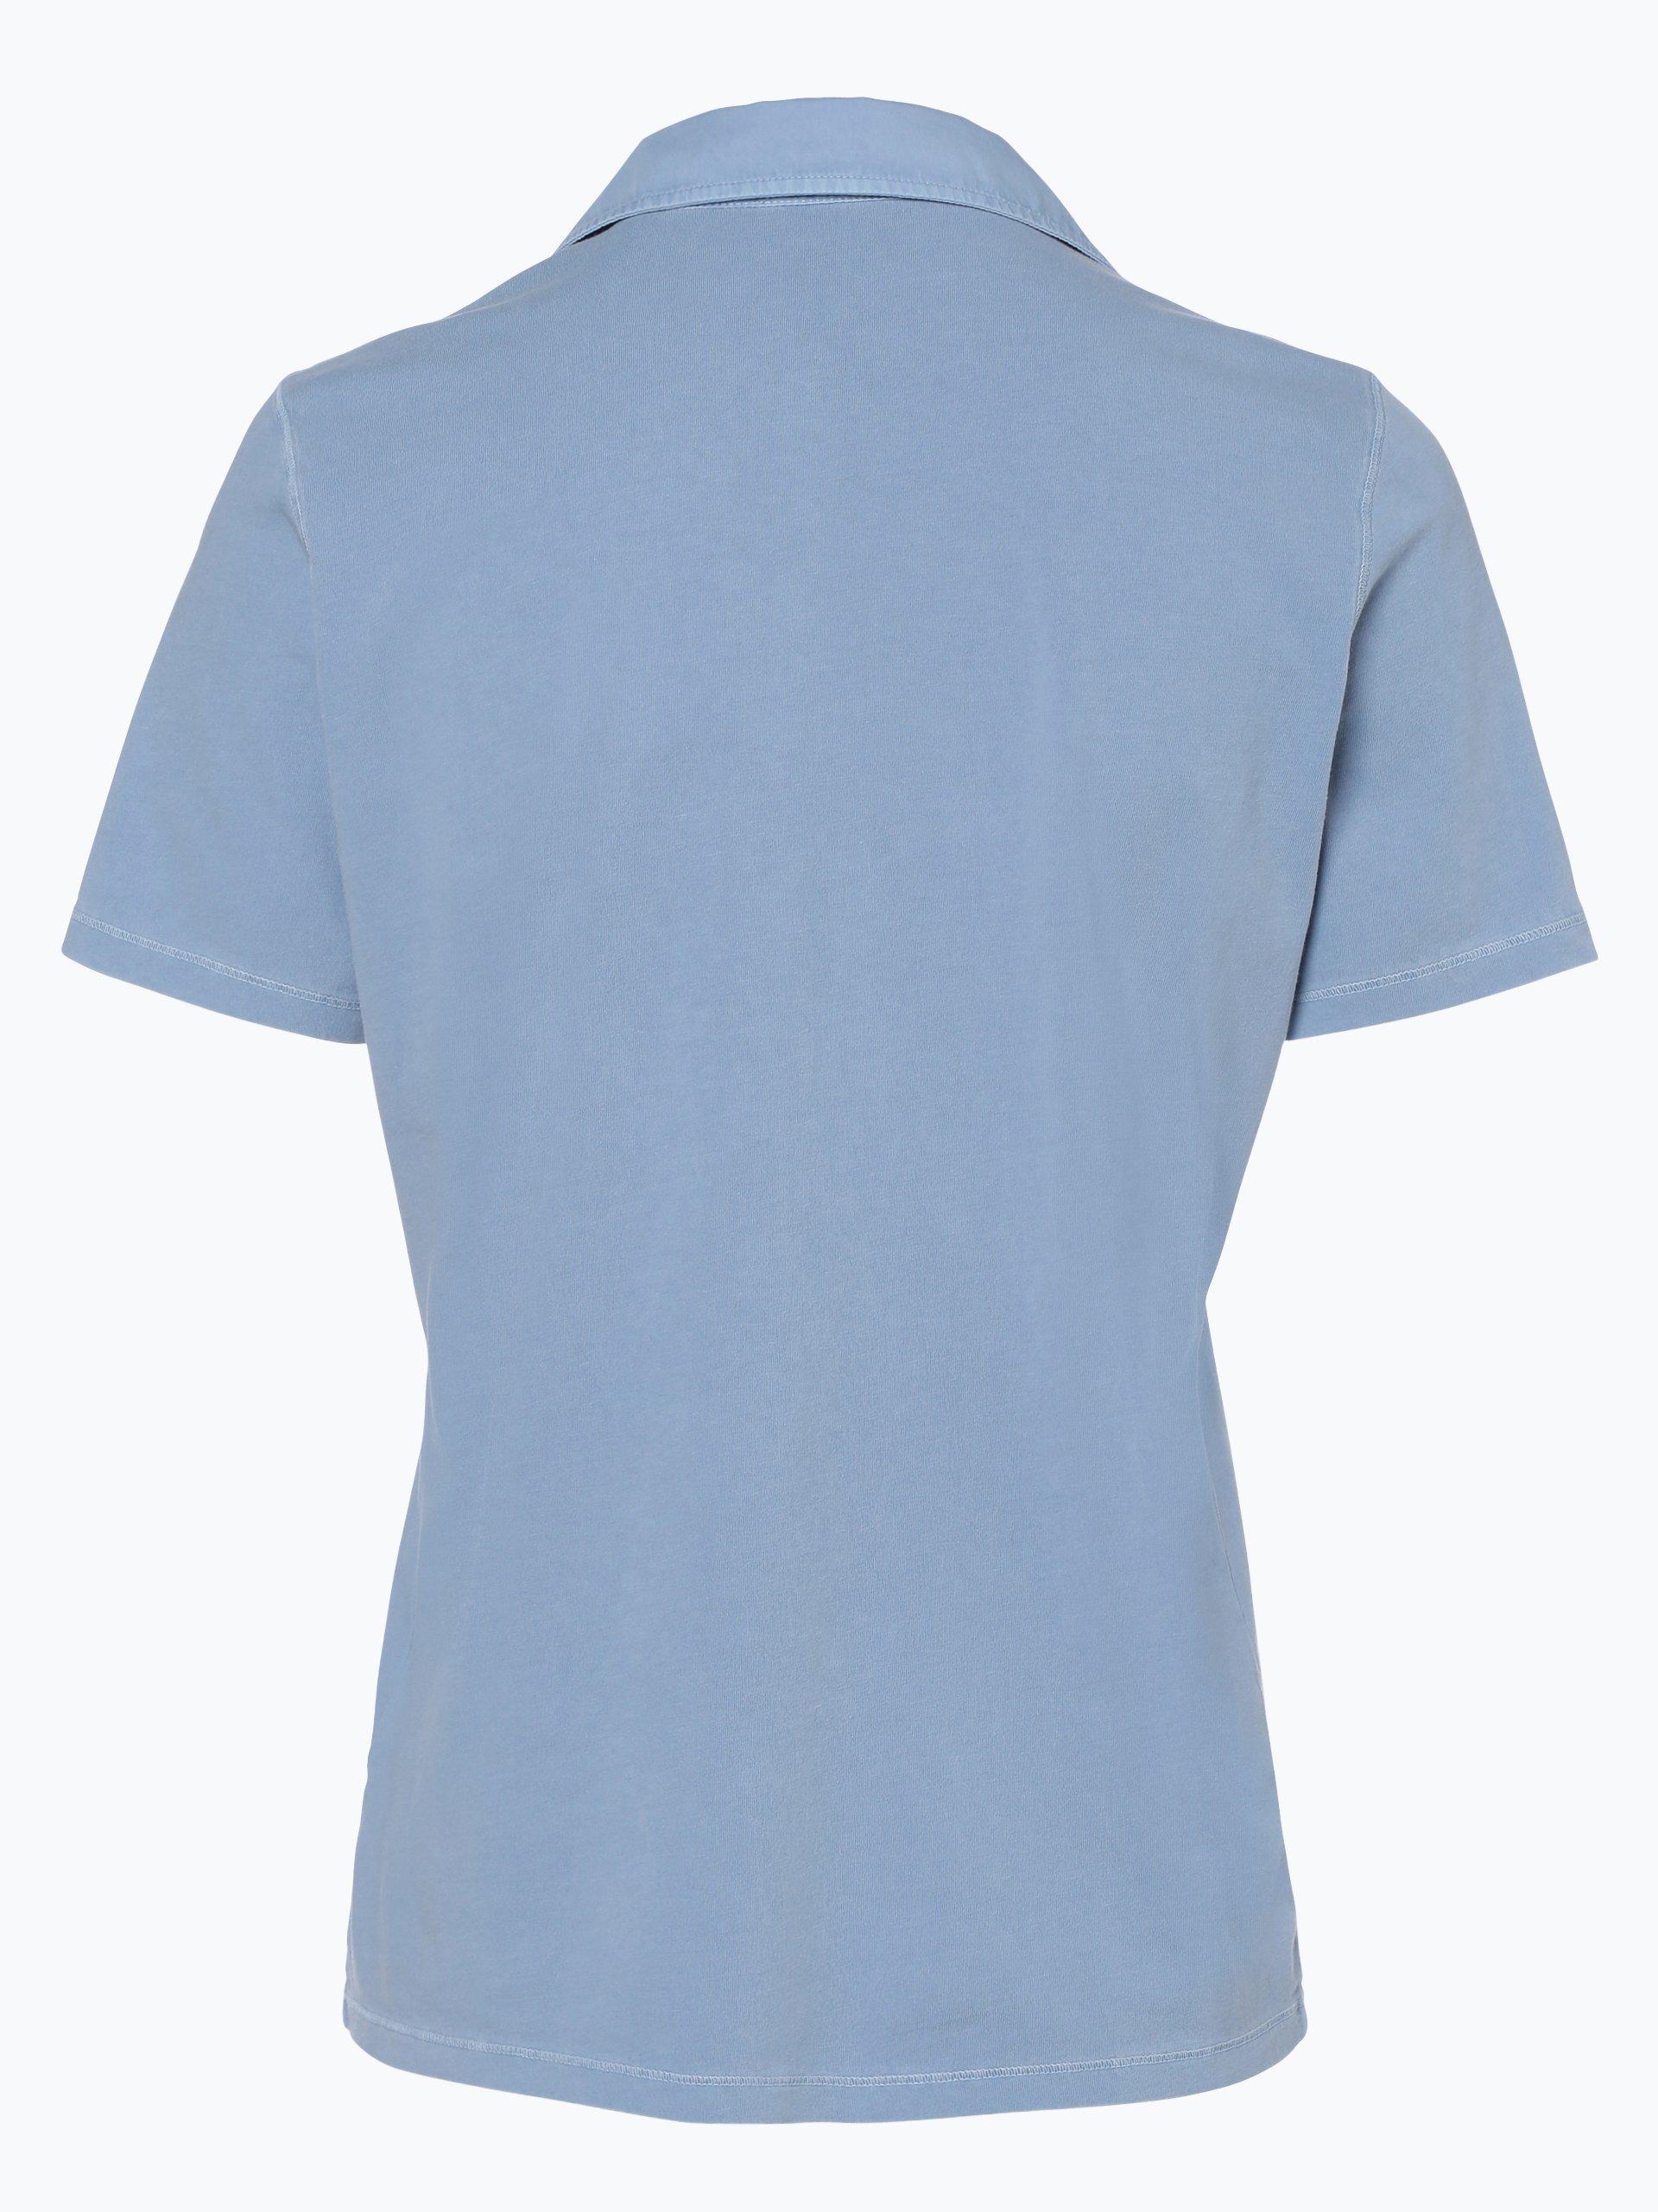 marc o 39 polo damen t shirt hellblau gestreift online kaufen. Black Bedroom Furniture Sets. Home Design Ideas